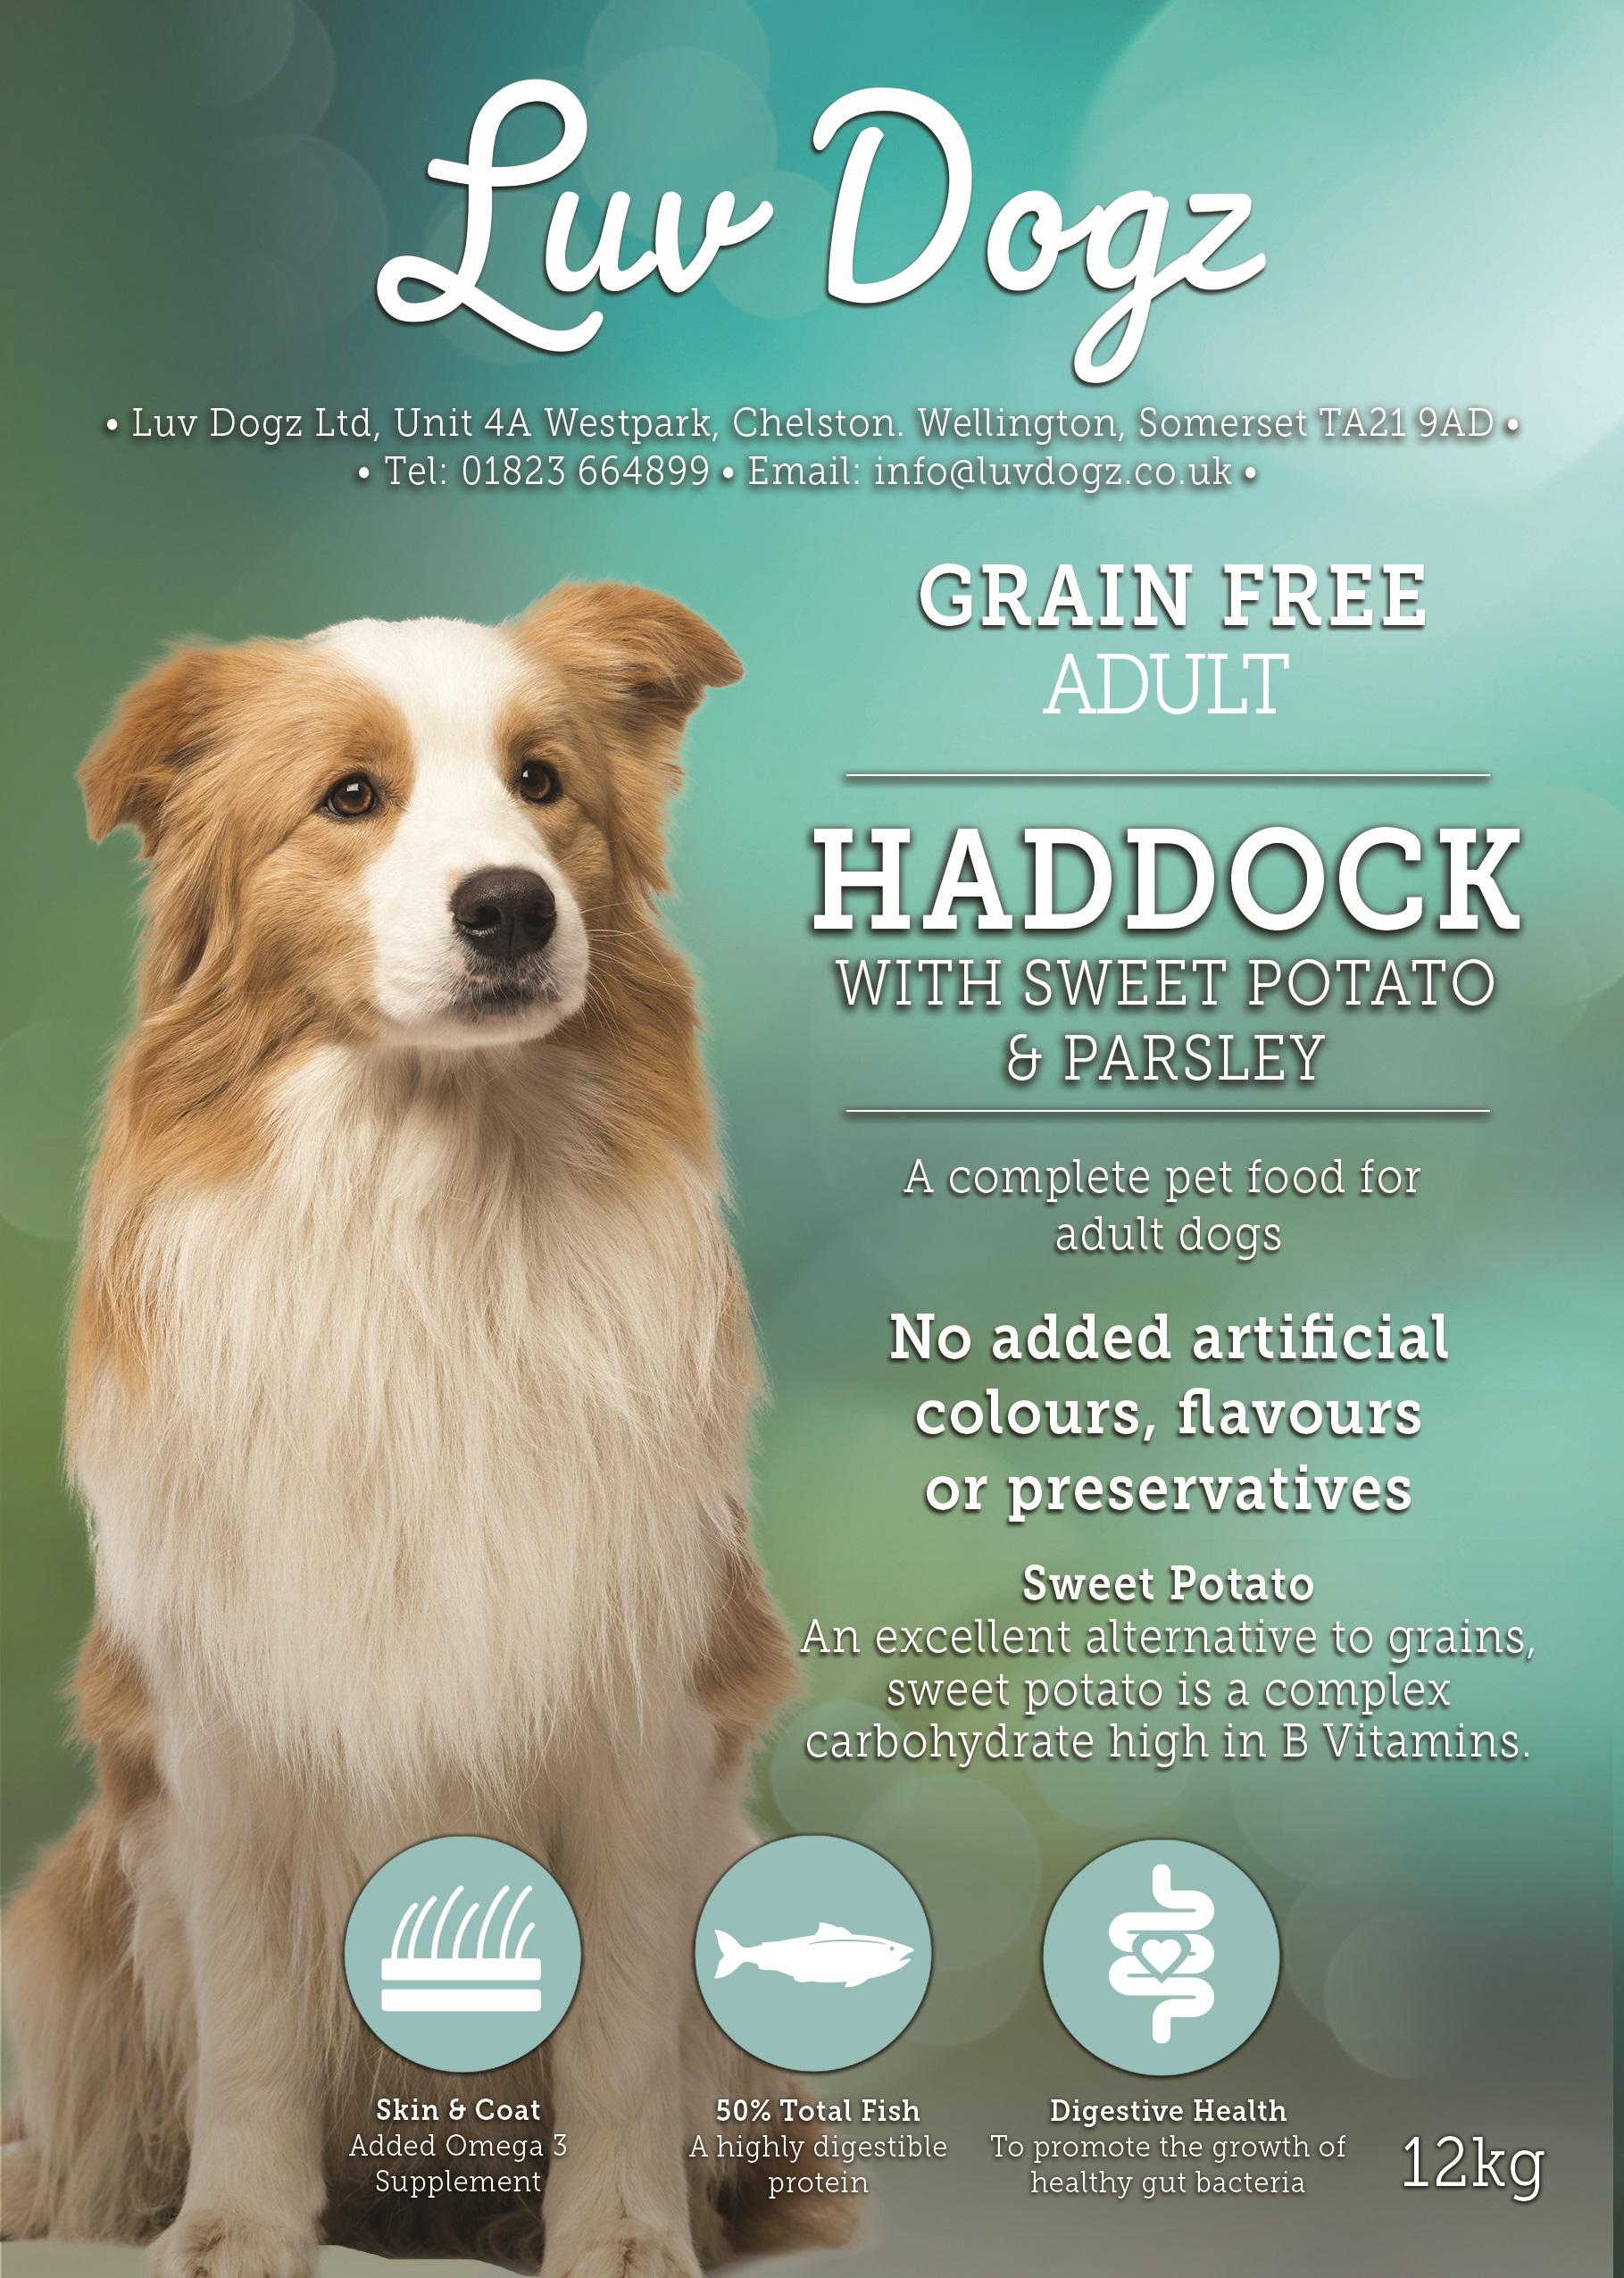 Grain Free Adult 50% Haddock With Sweet Potato and Parsley